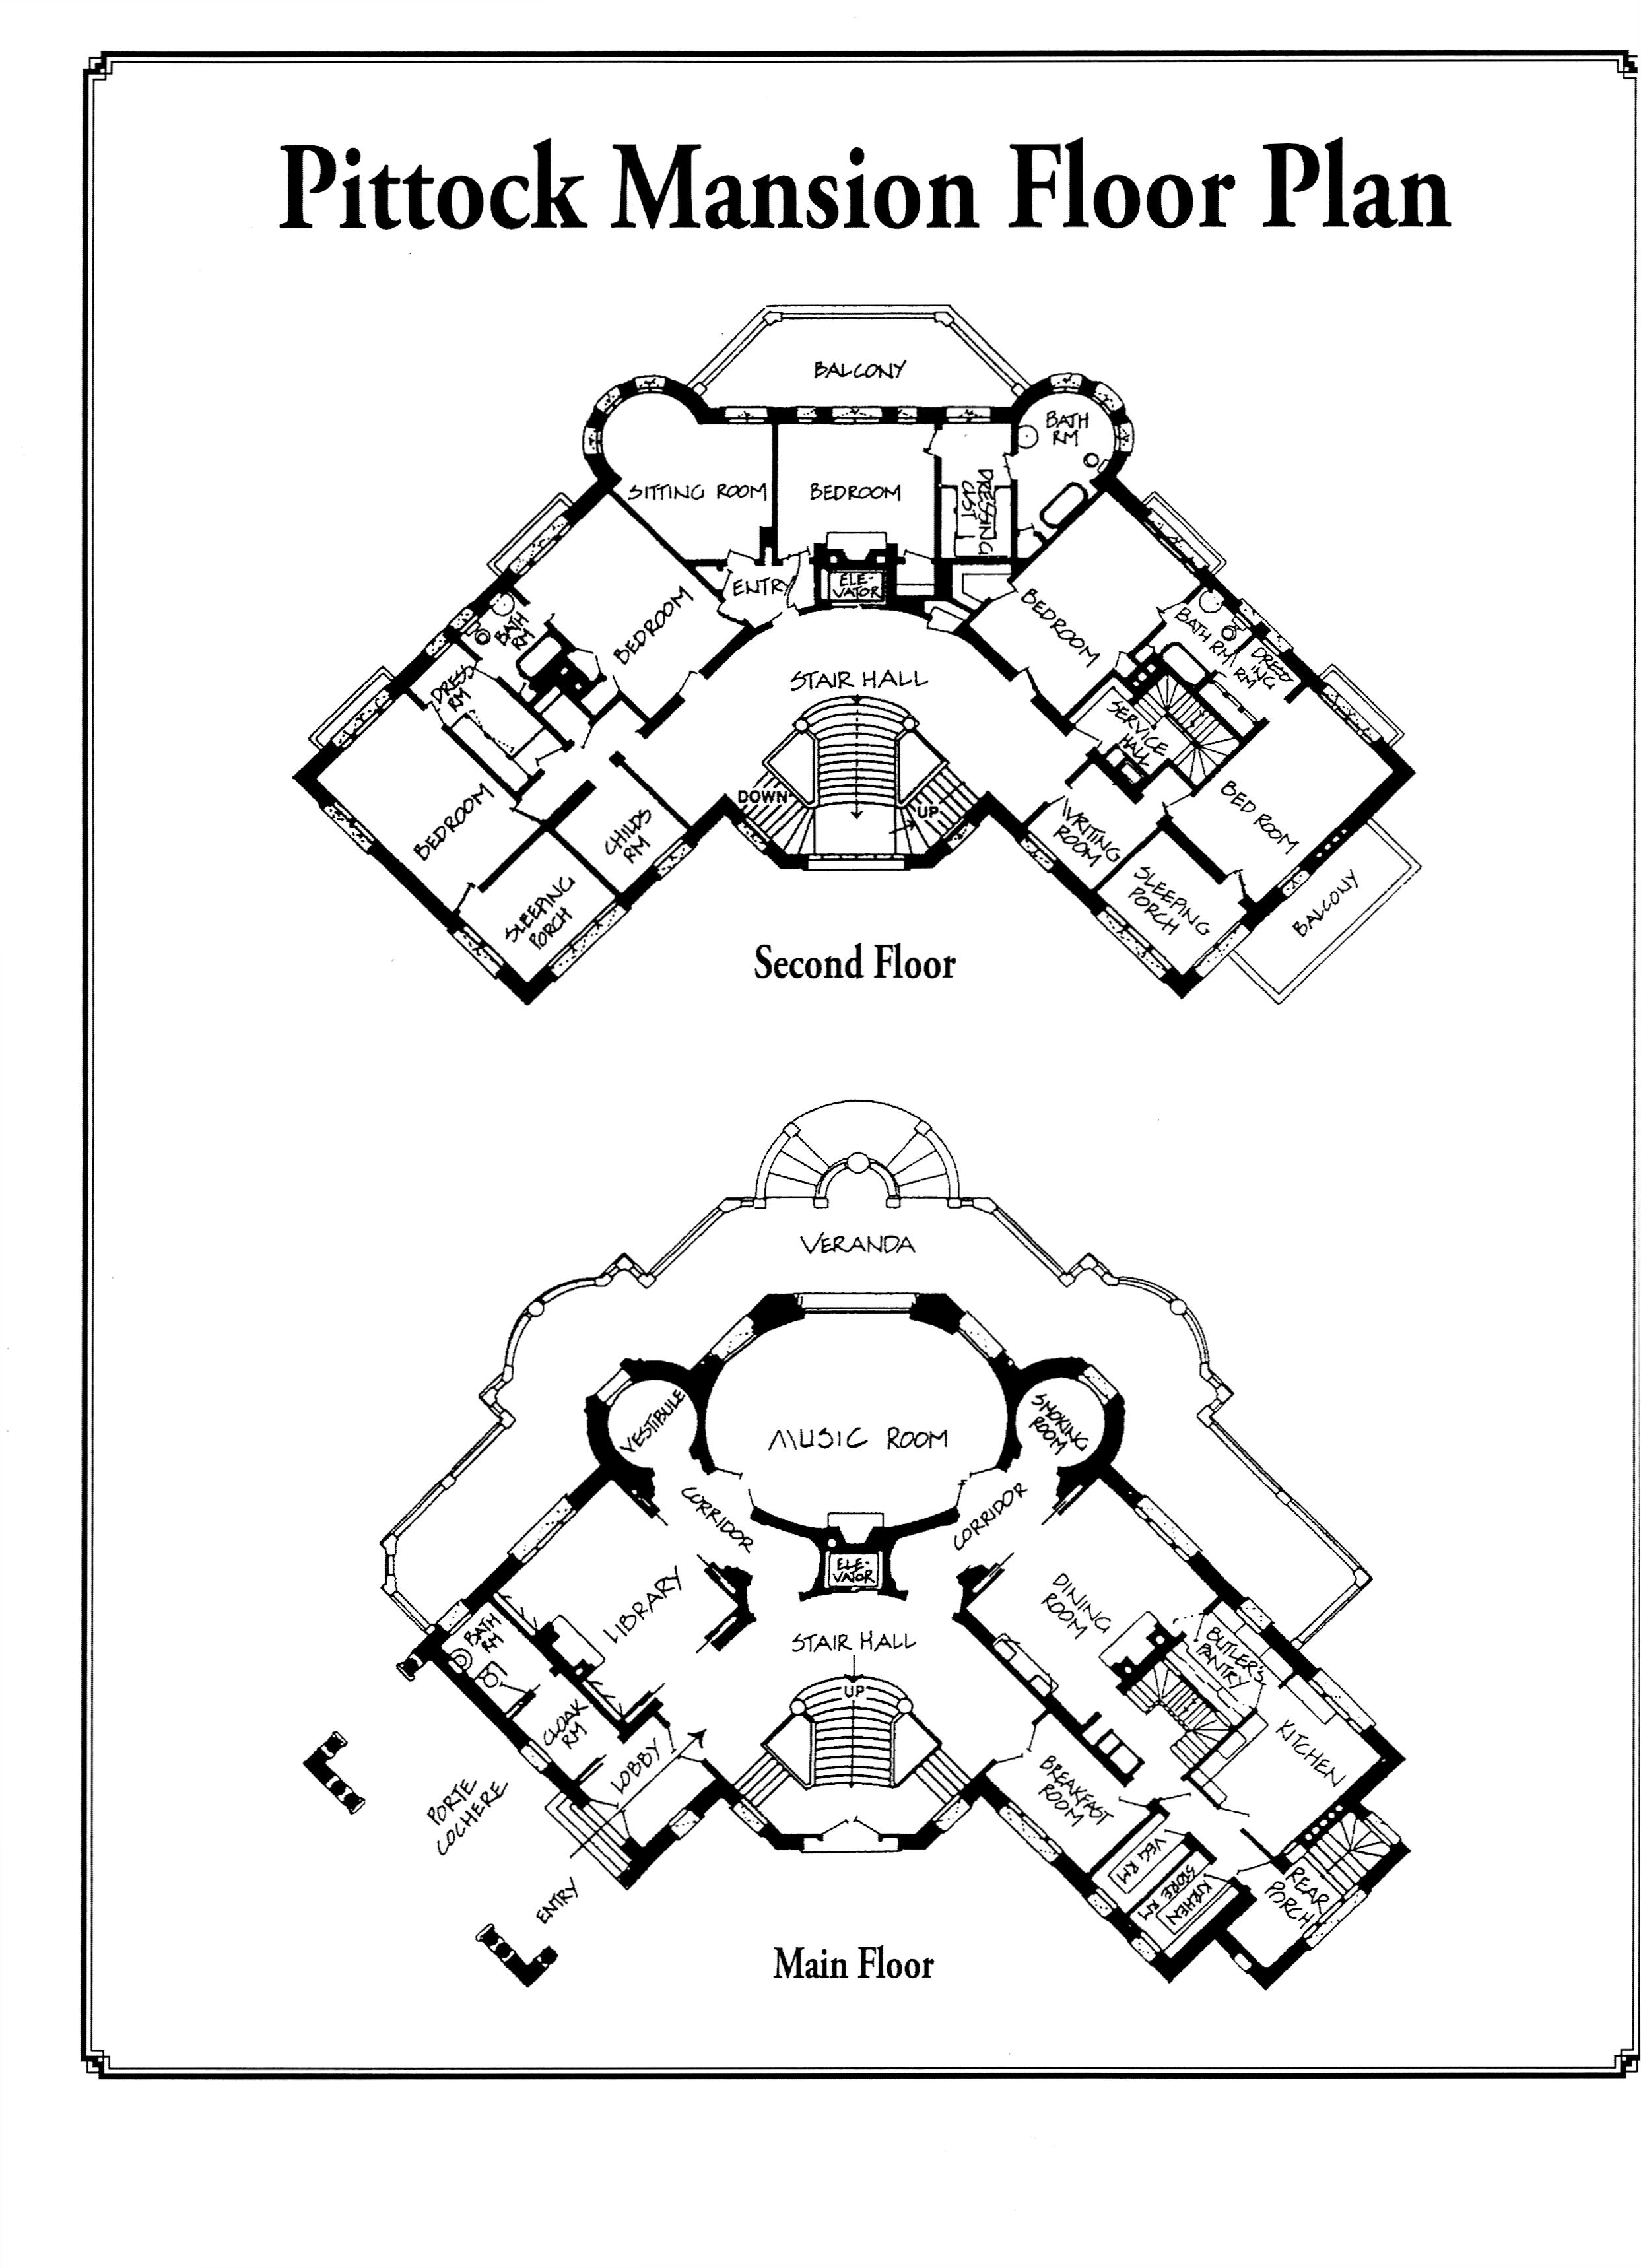 pittock-mansion-floor-plan-1.jpg